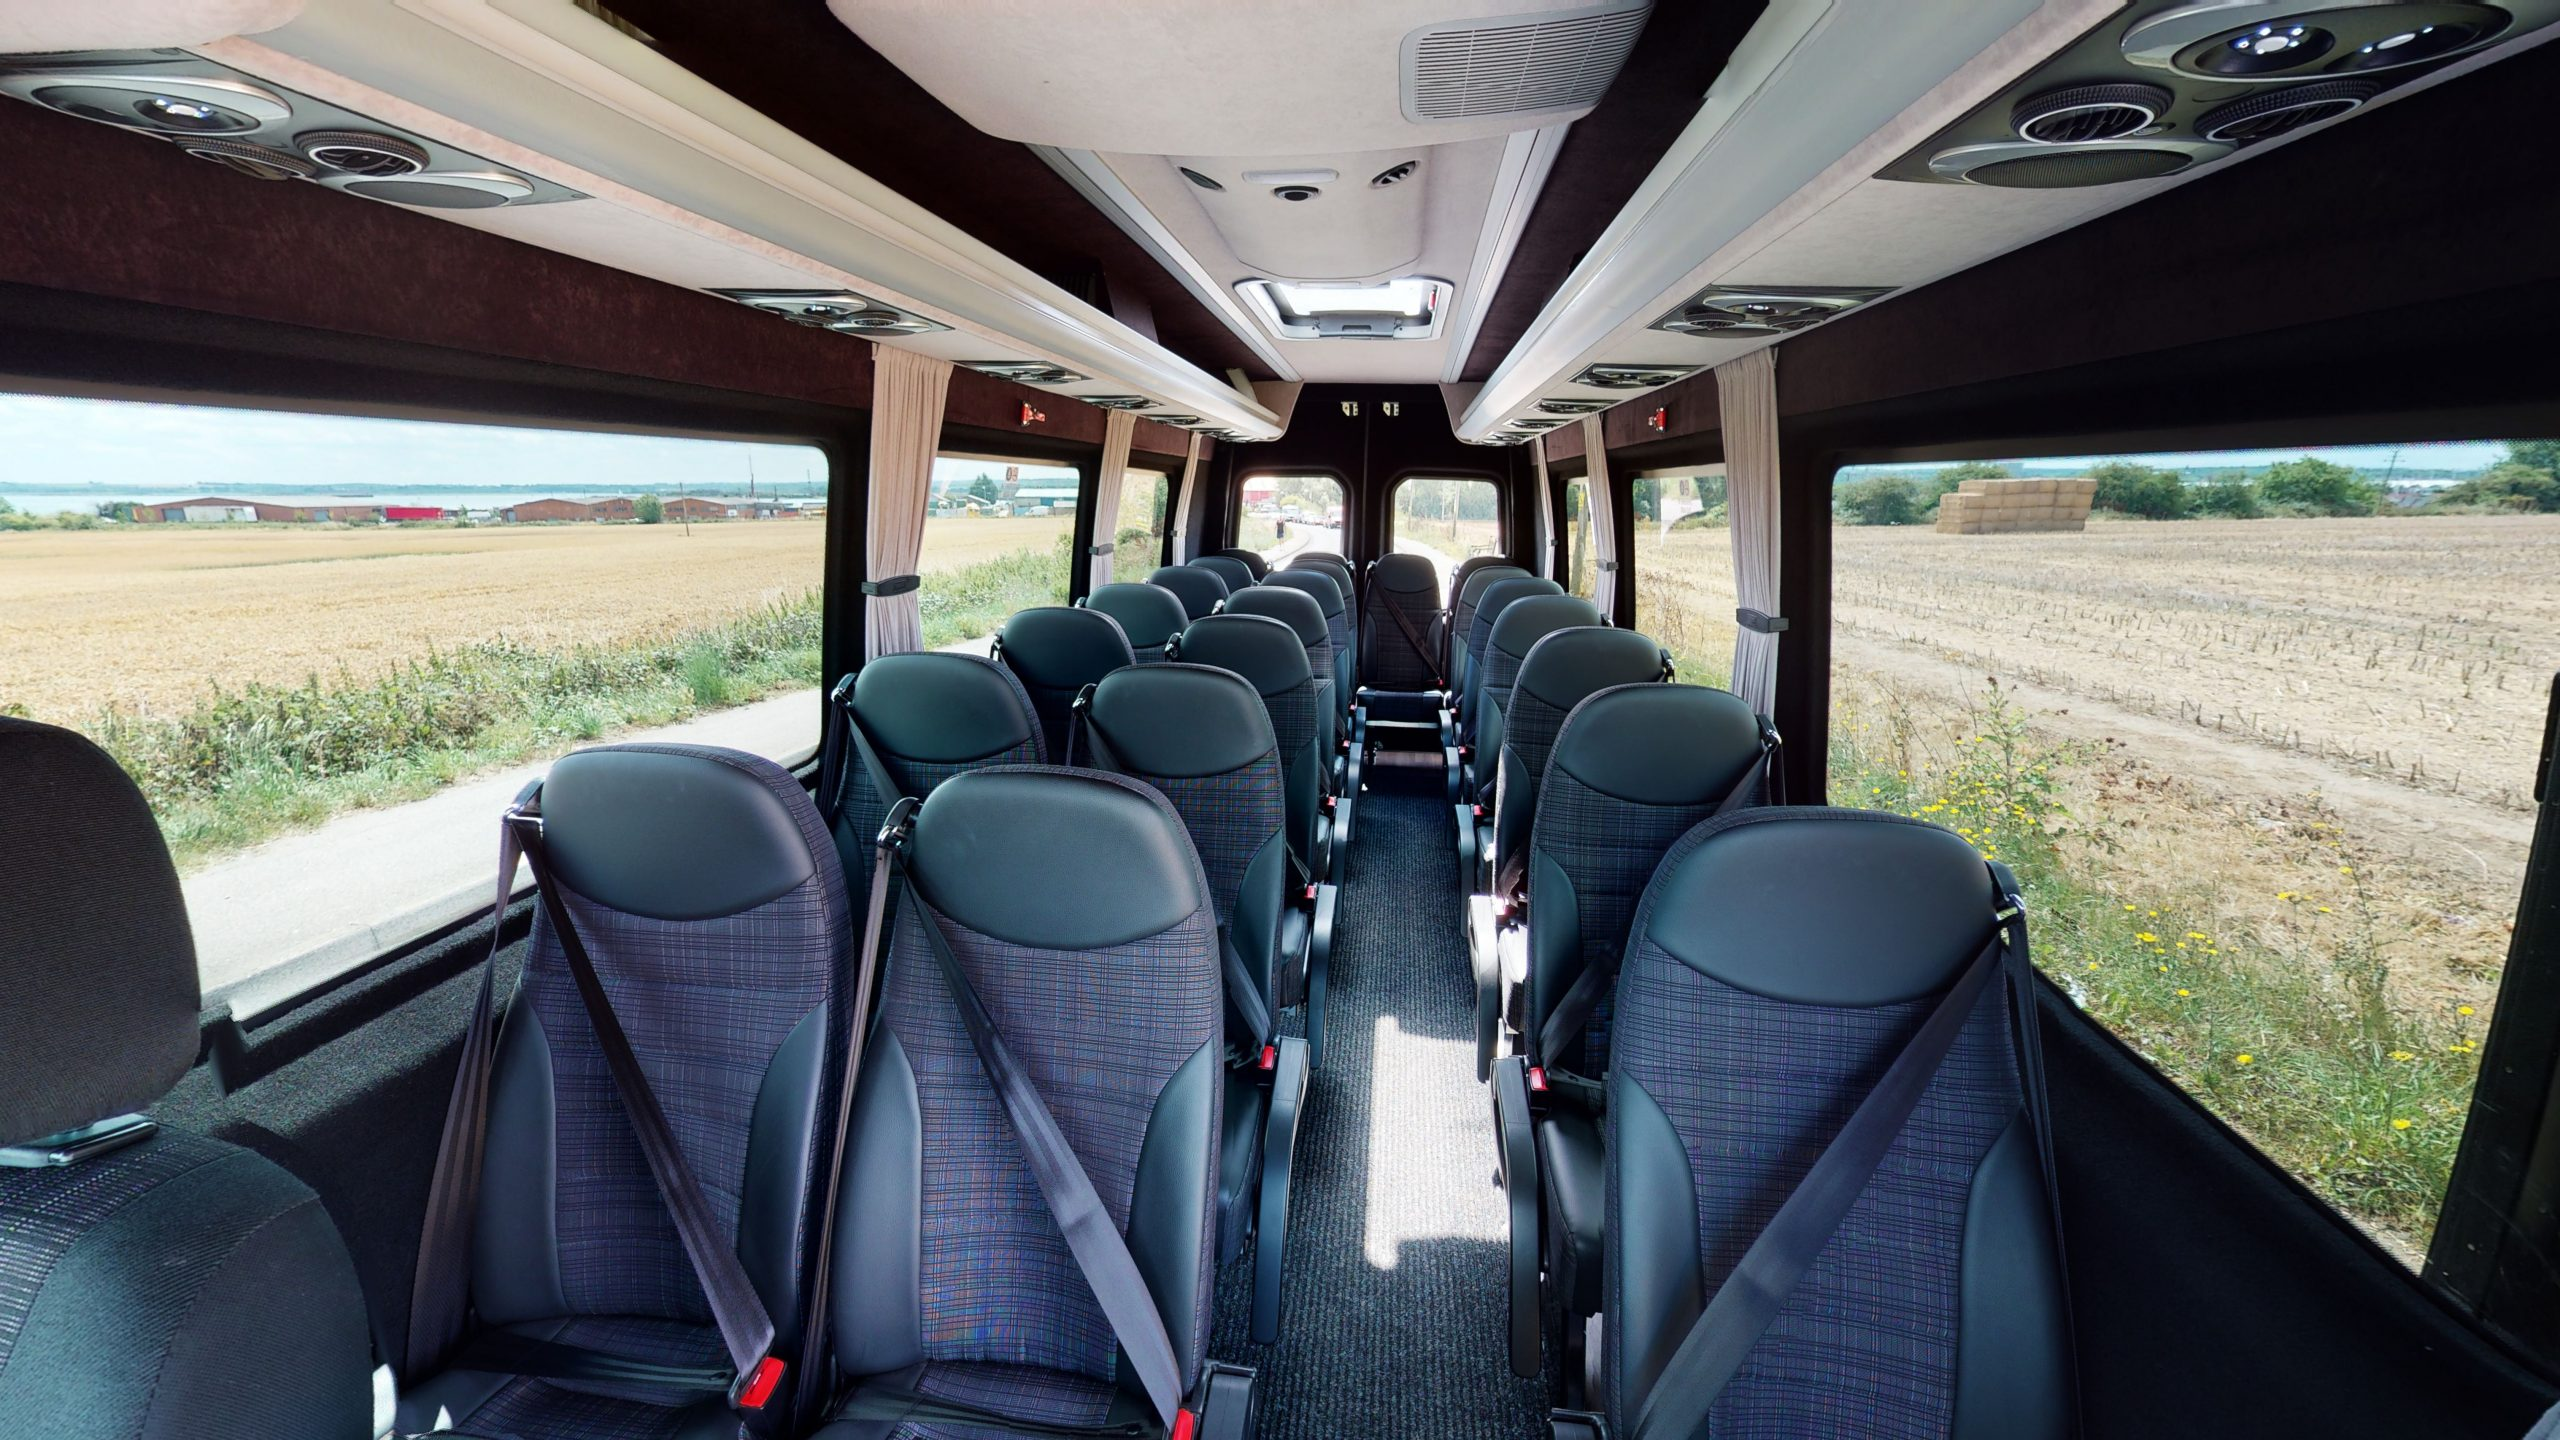 farleigh coaches 22 seater minibus